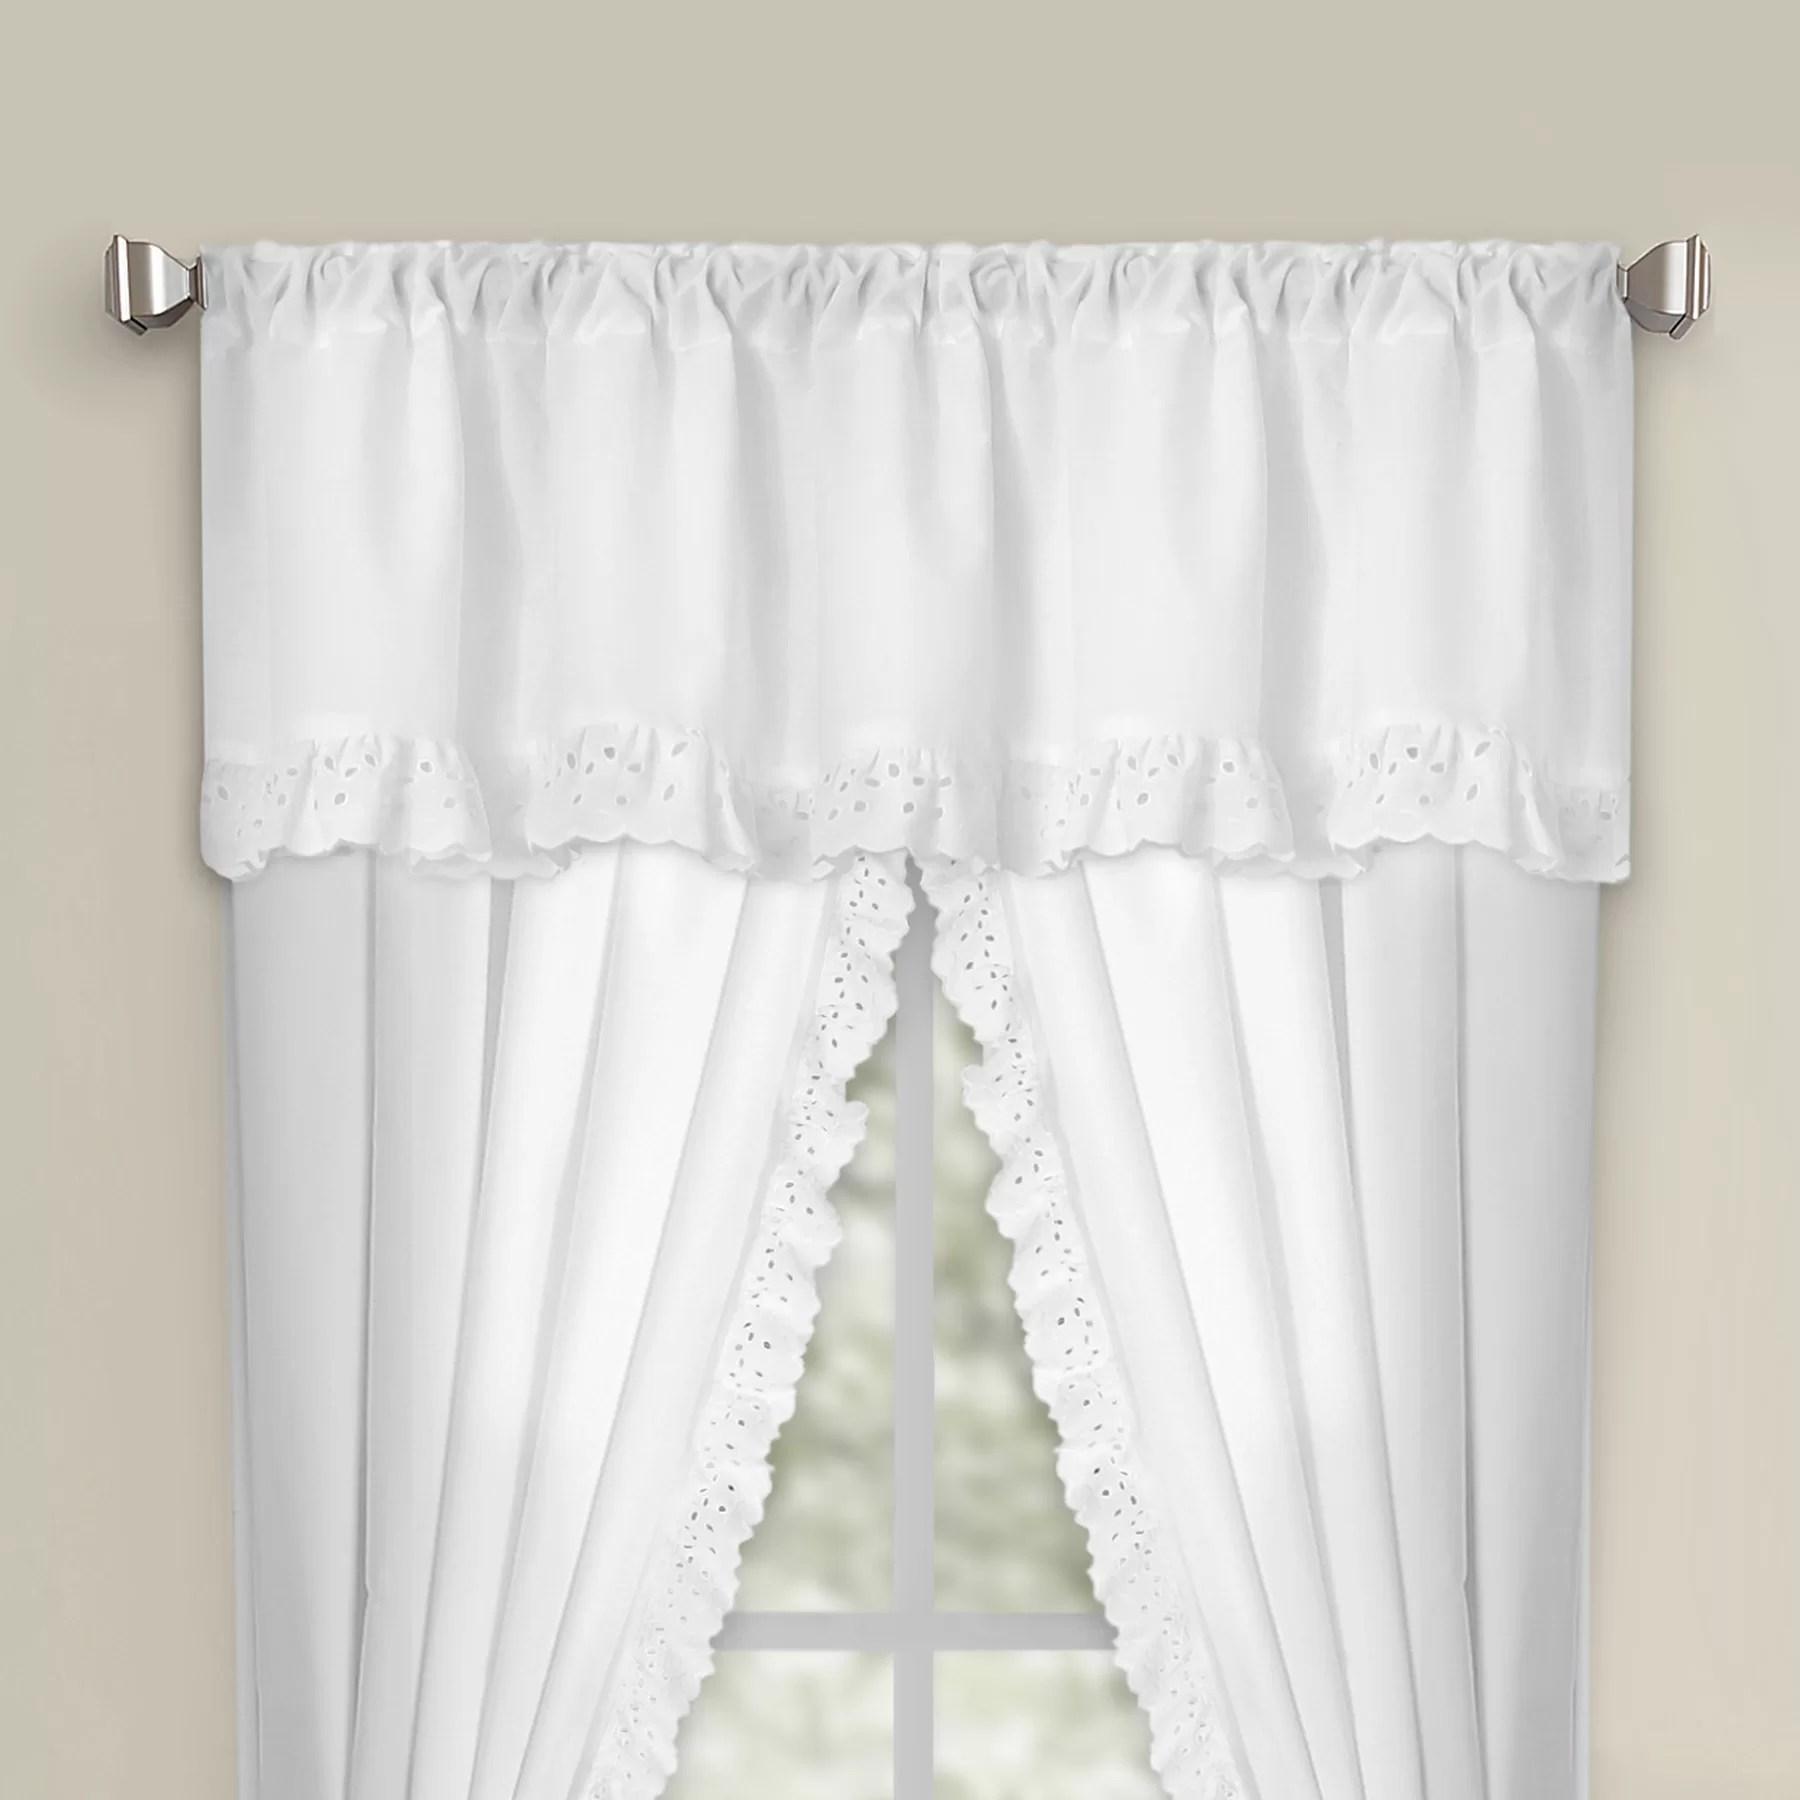 Fresh Ideas Eyelet Rod Pocket Curtain Valance EBay